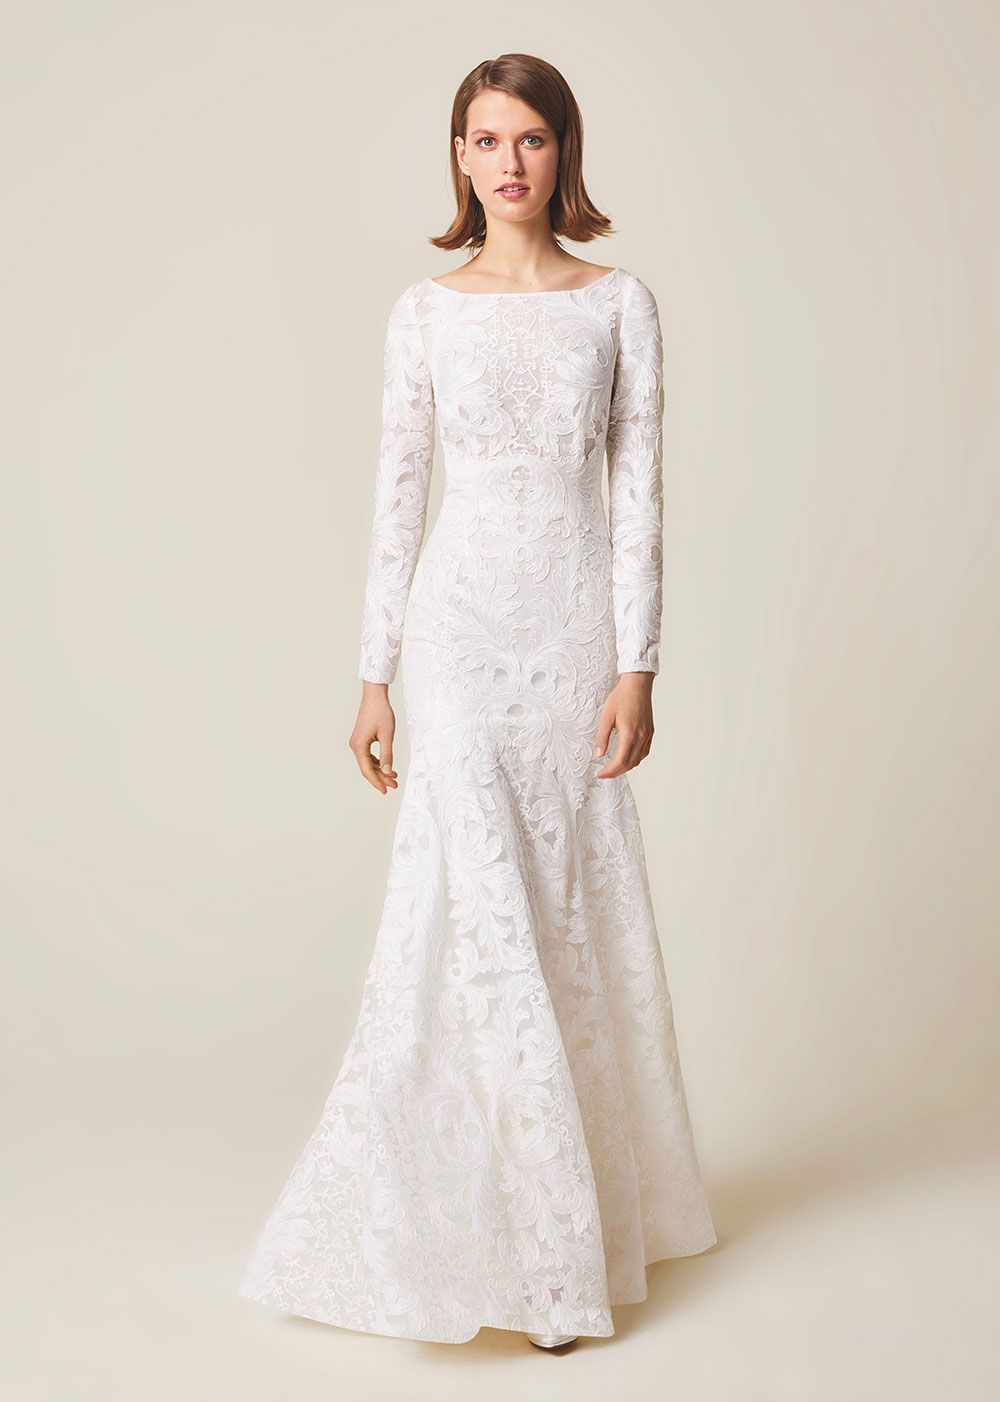 Royal themed wedding dresses   unique lace full length long sleeve wedding dress Jesus Peiro